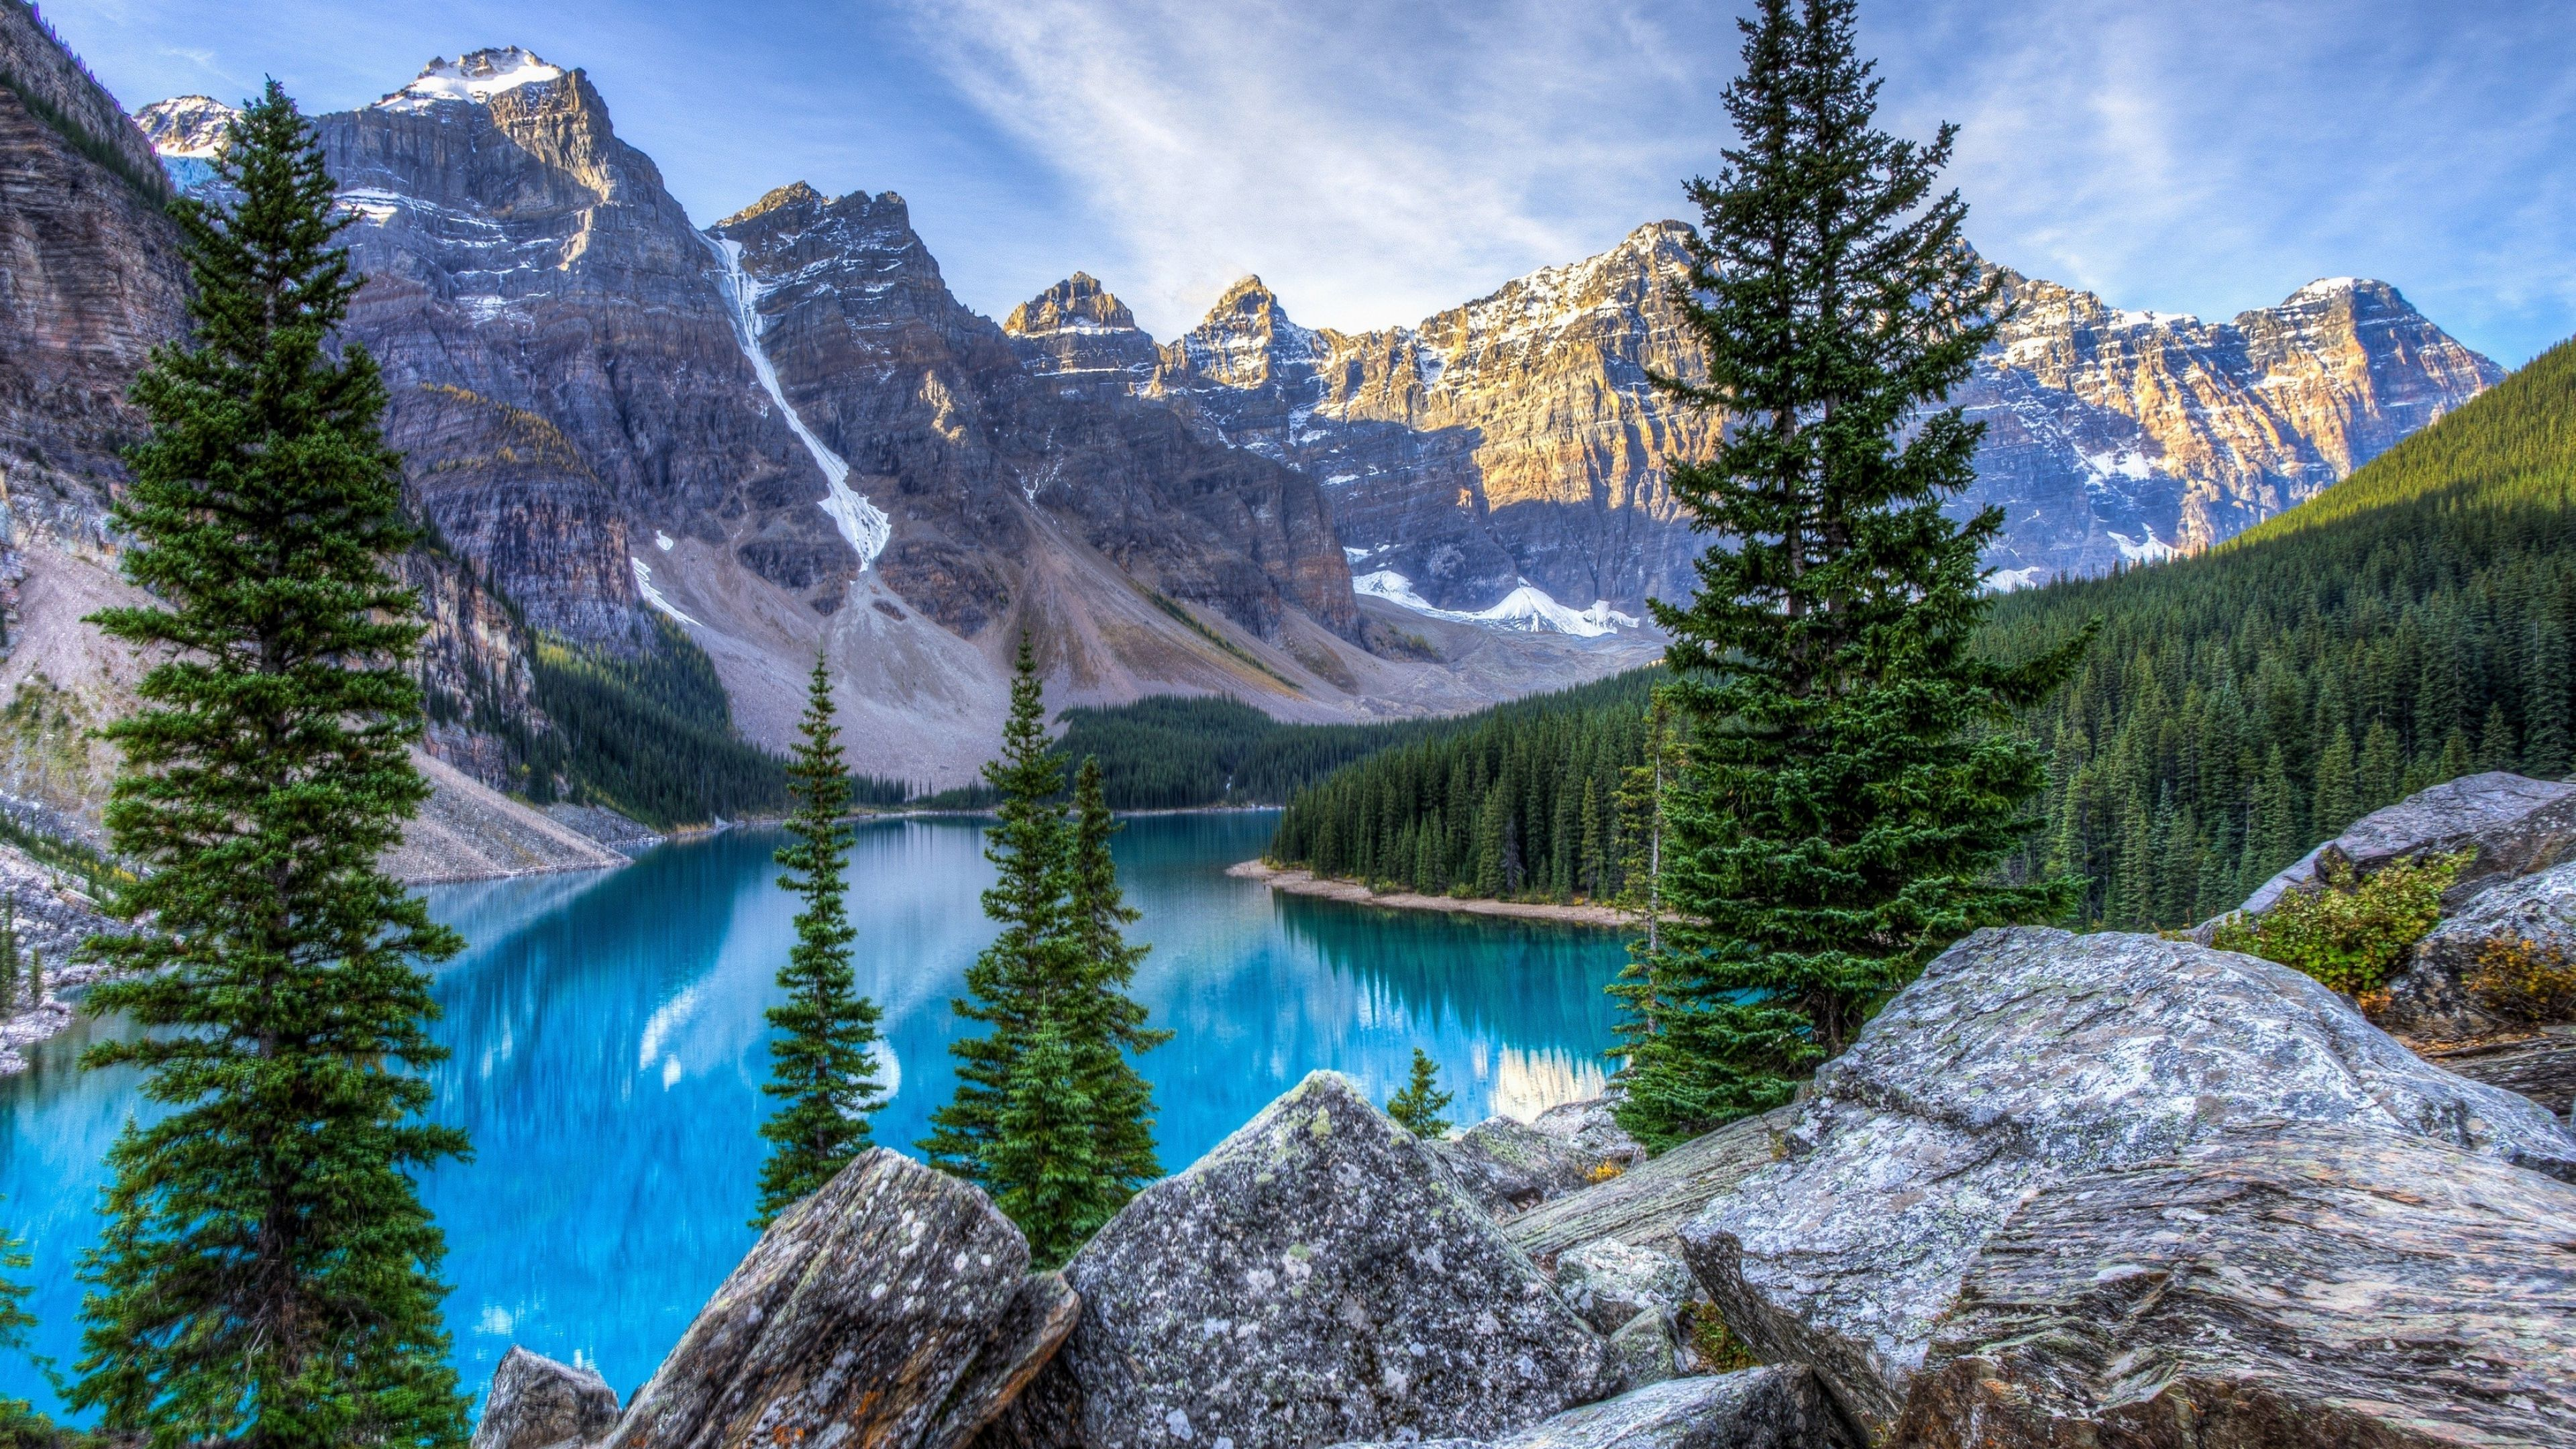 Moraine Lakecanada Oc 38402160 Https Ift Tt 2lbnwz6 Lake Landscape Mountain Photos Canada Lakes